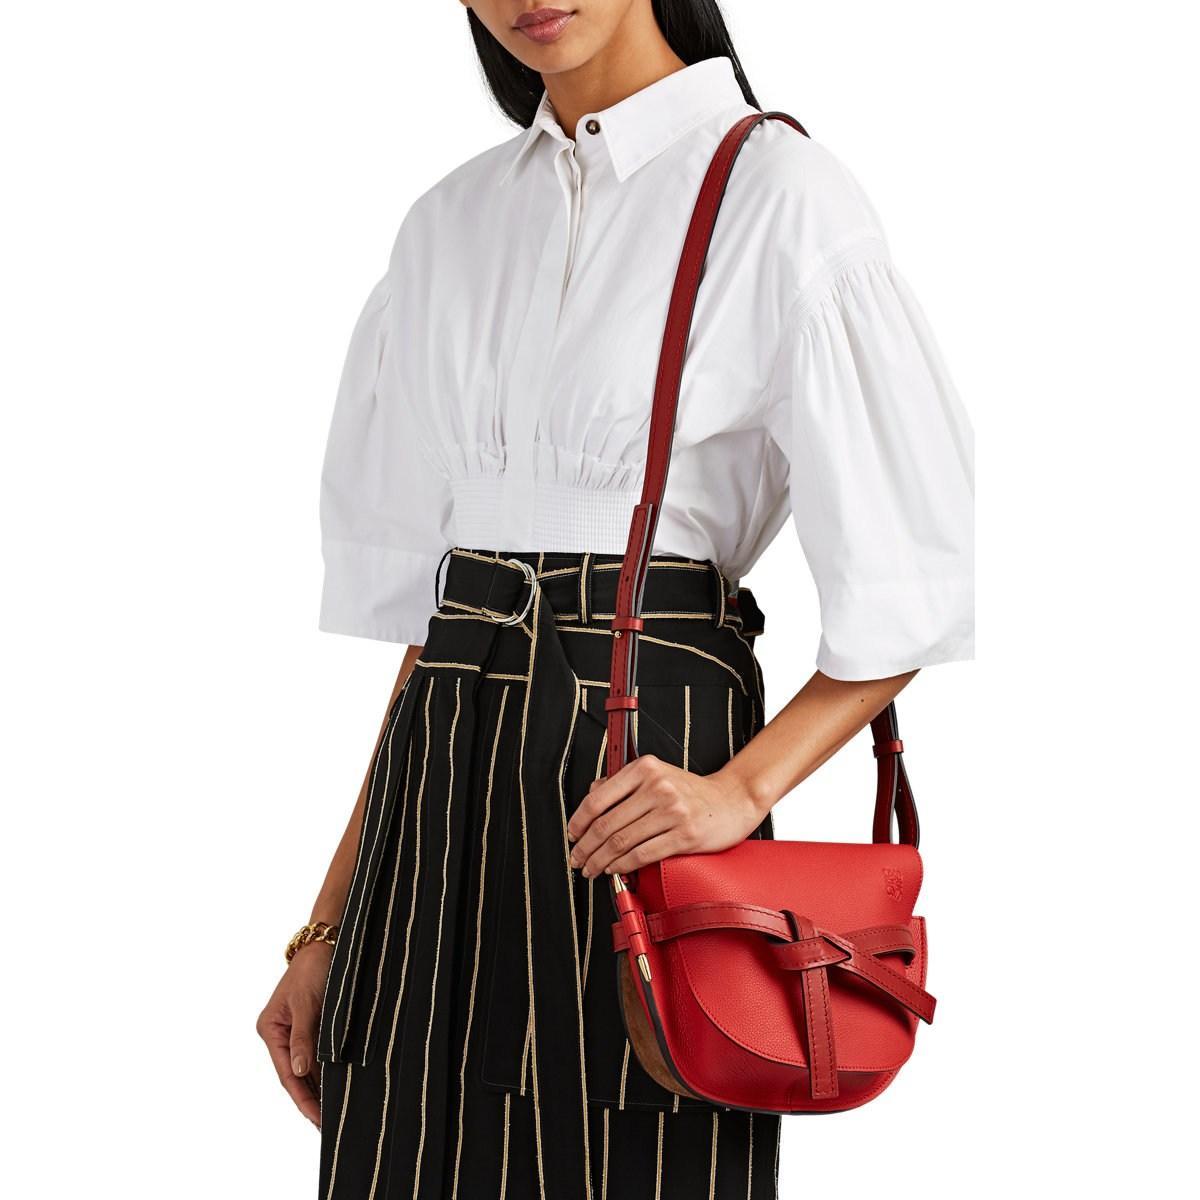 1d7851fa4e4a Loewe - Red Gate Small Leather Shoulder Bag - Lyst. View fullscreen